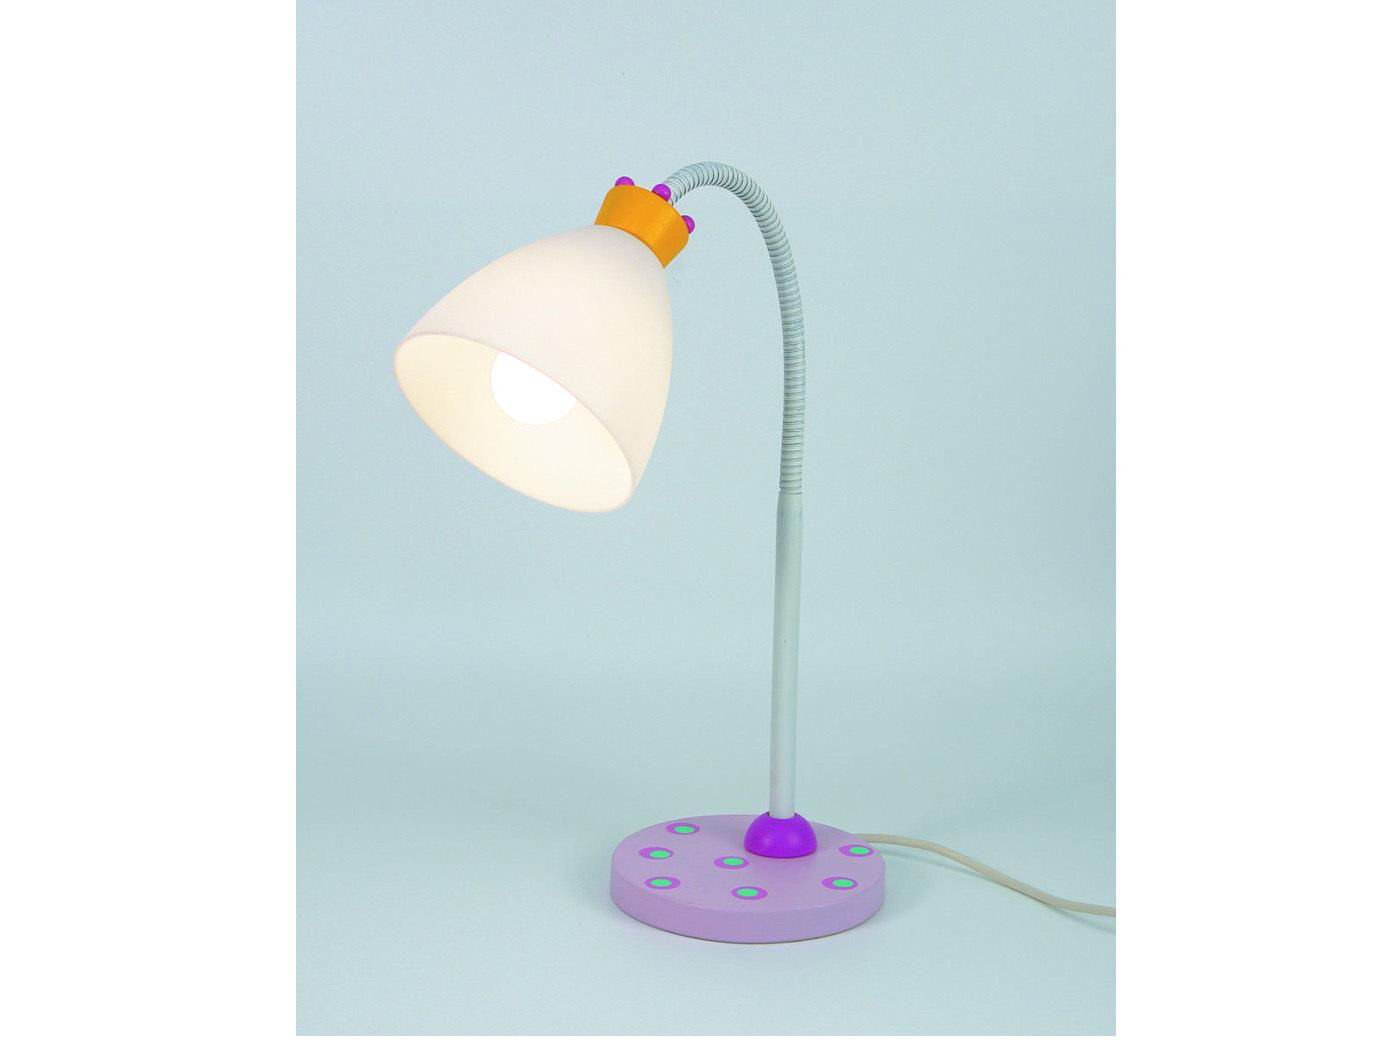 LED-lampara-de-lectura-flexrohr-coronitas-rosa-blanco-escritorio-LED-lampara-lampara-para-ninos